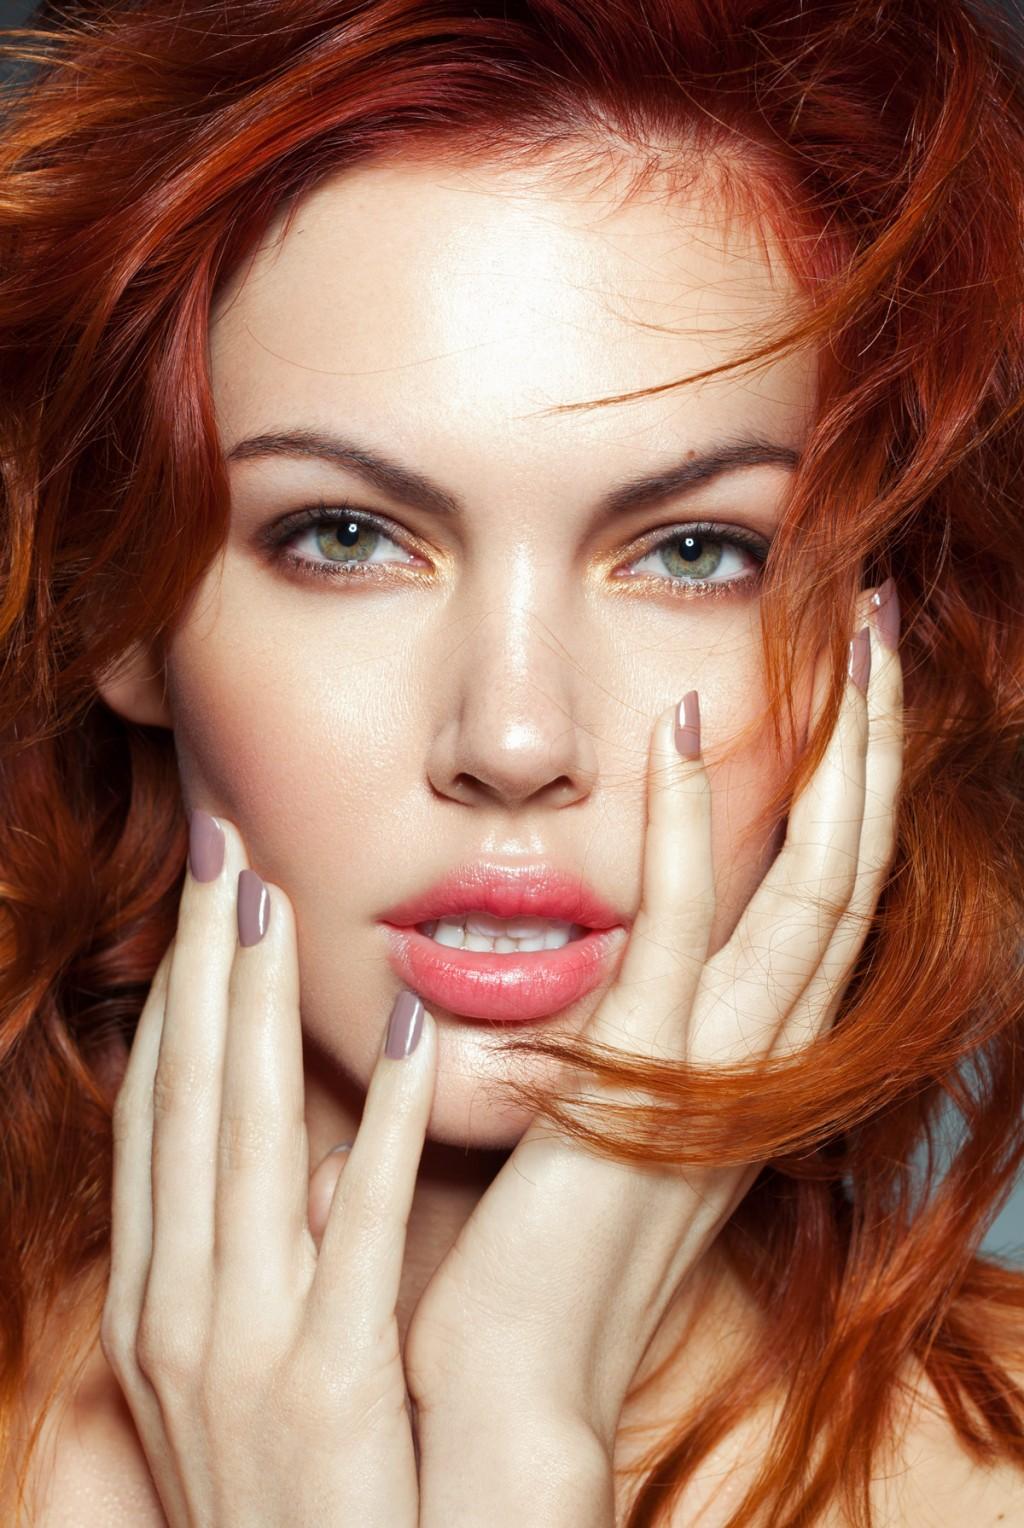 Makeup by Lupe Moreno, photo & post by Julia Kuzmenko McKim